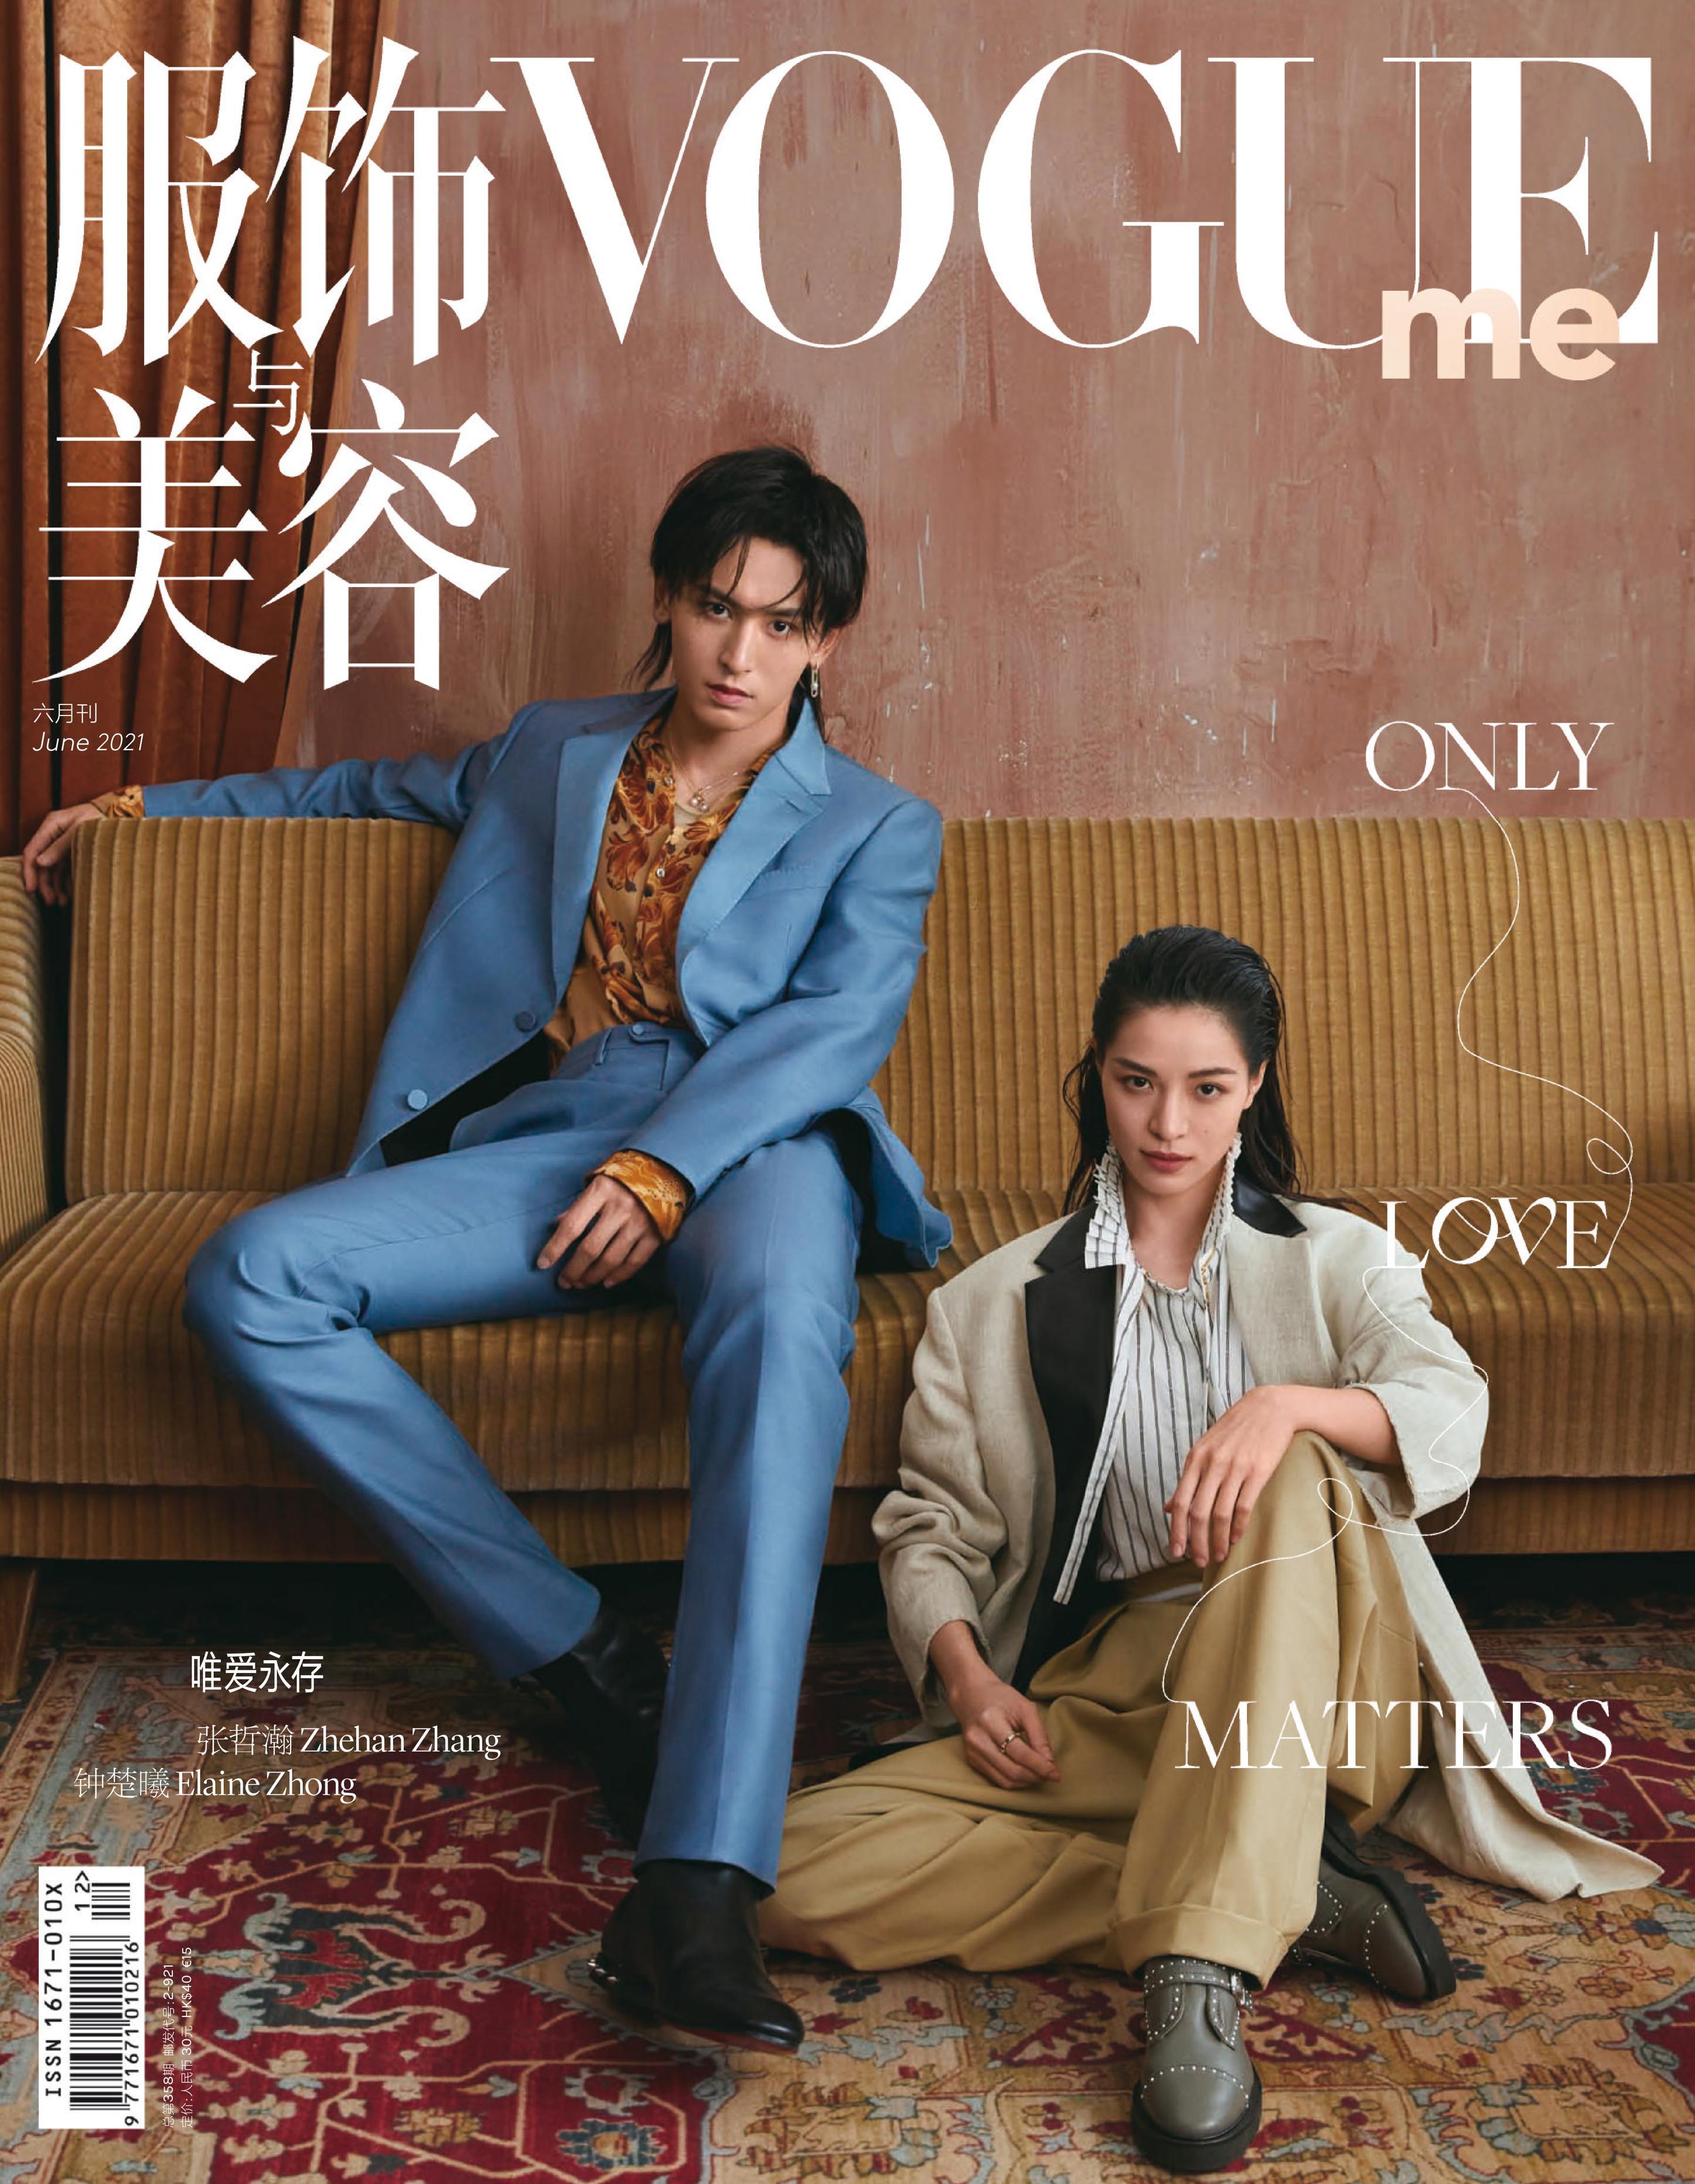 Vogue Me - 七月 2021